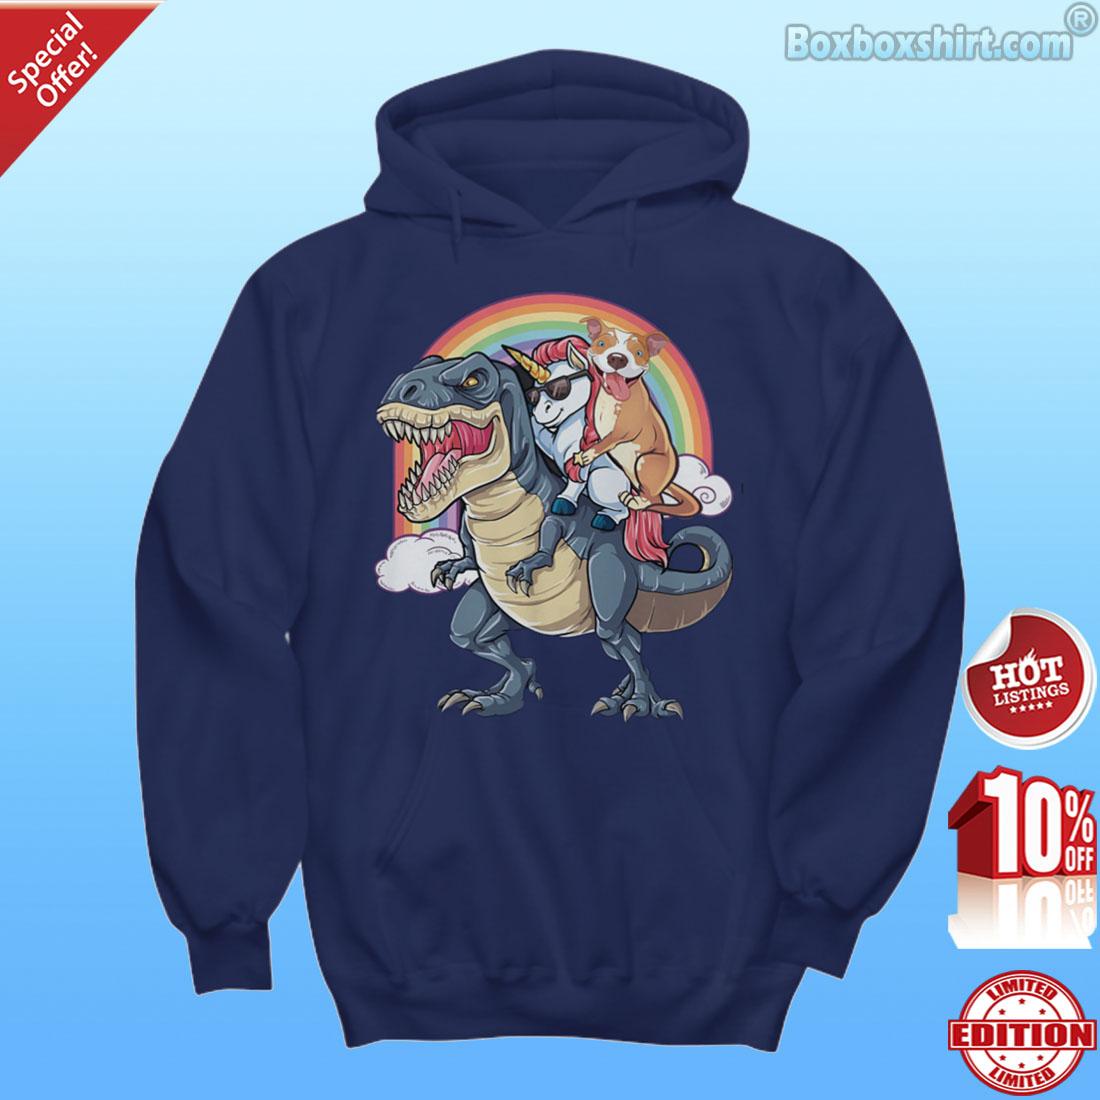 Unicorn and a pit bull riding a dinosaur shirt